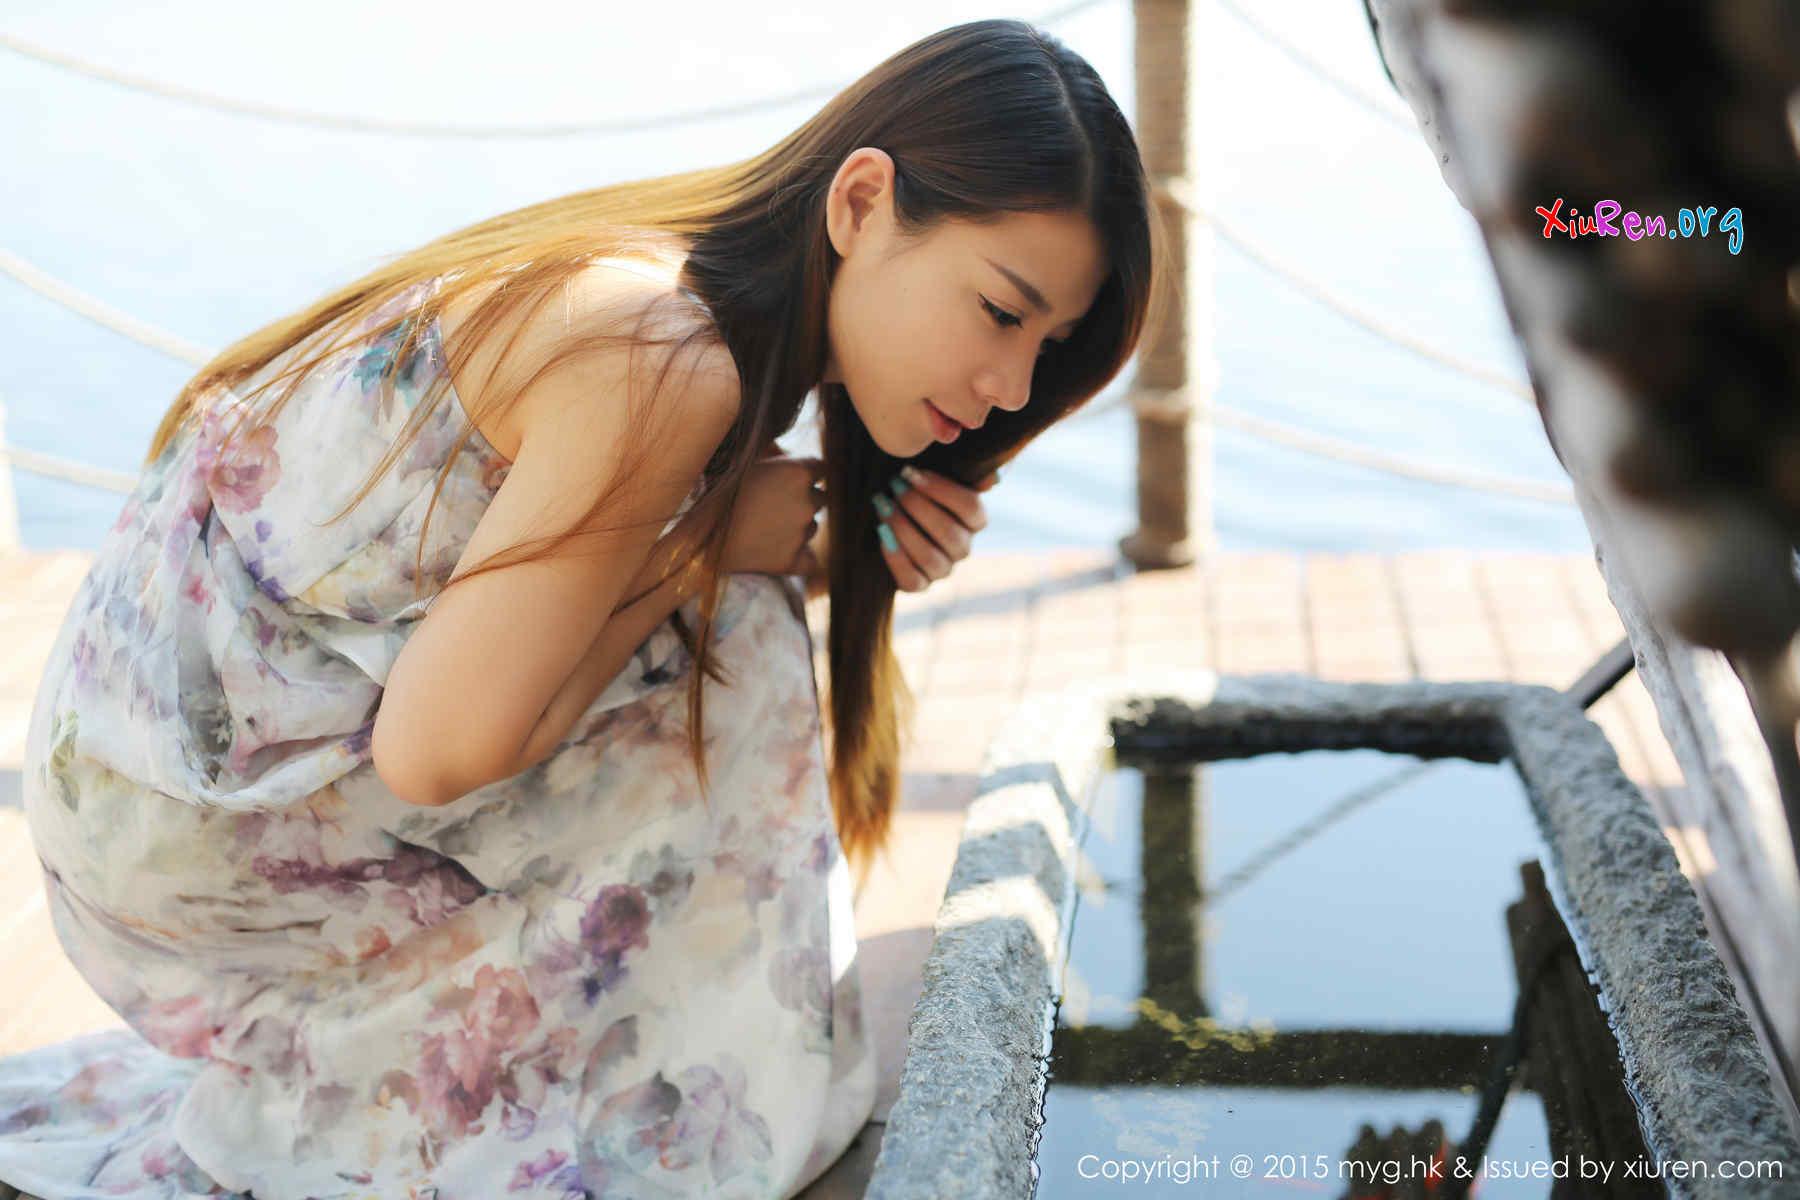 PhimVu-Blog-0016.jpg